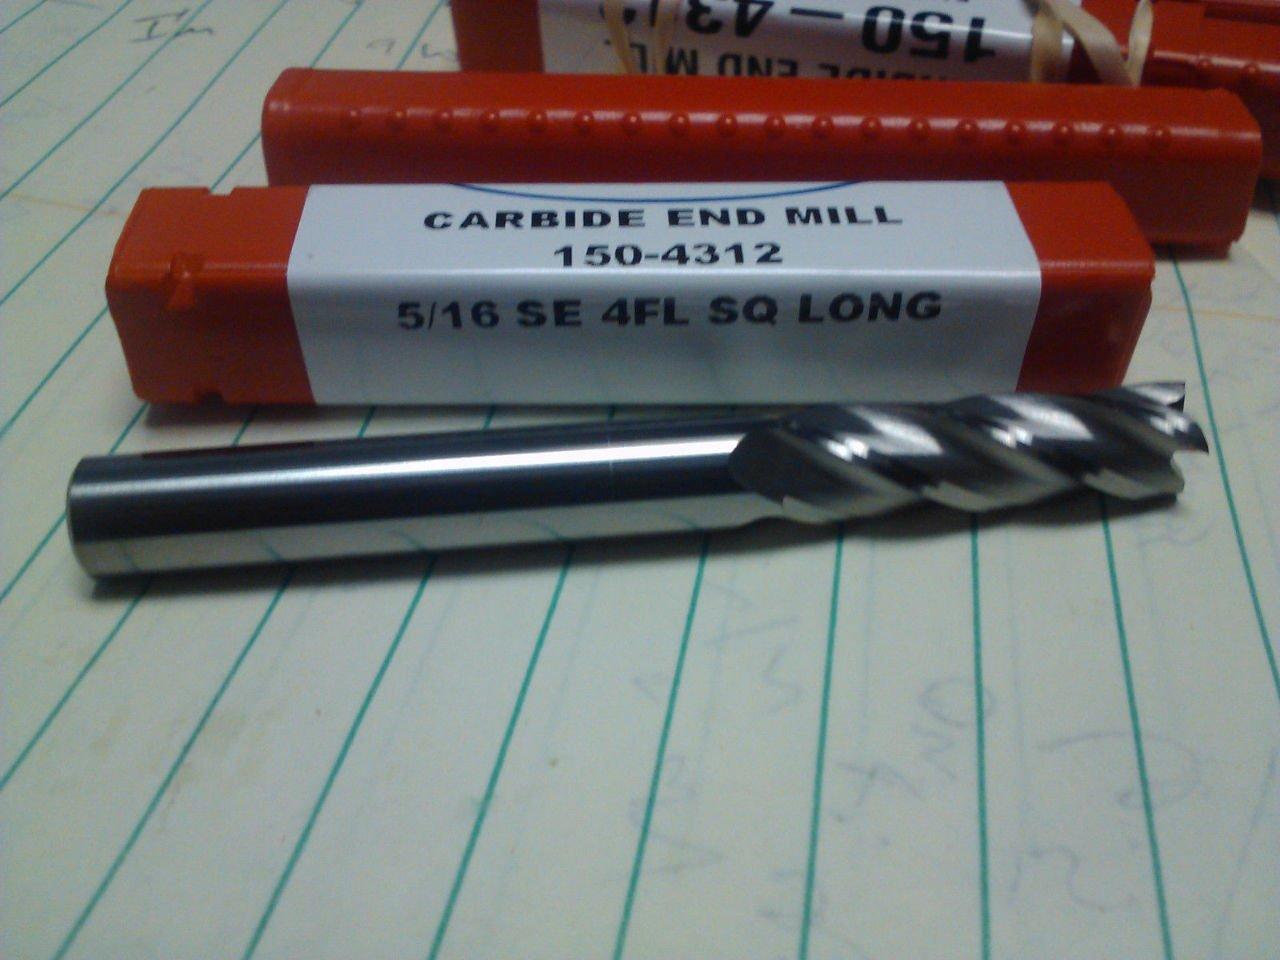 ".3125/"" 5//16/"" 4 FLUTE SINGLE END STUB CARBIDE BALL END MILL 5//16/"" X 1//2/"" X 2/"""